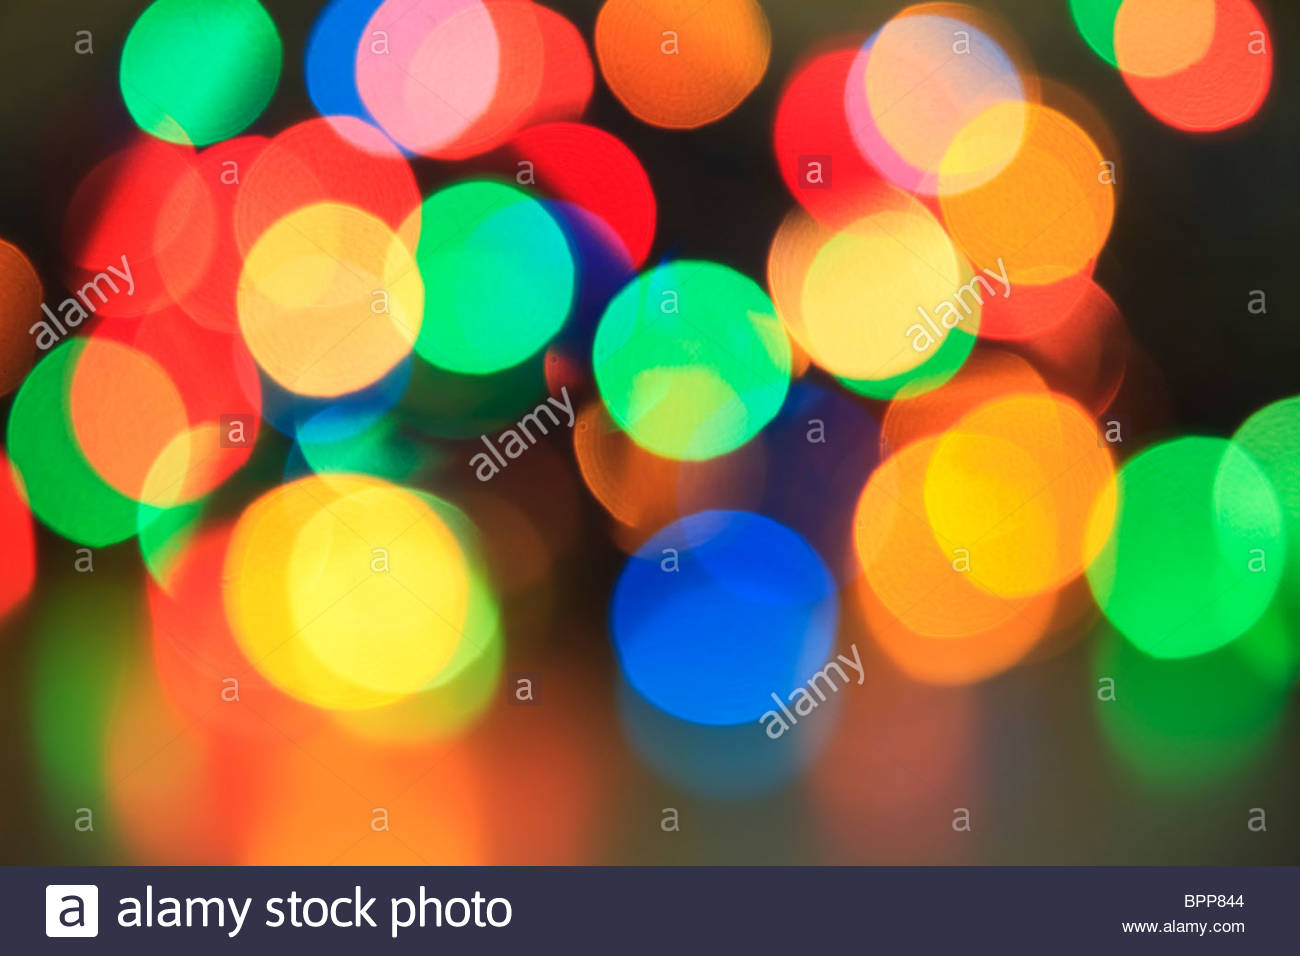 Aus Fokus Weihnachtsbeleuchtung Stockbild